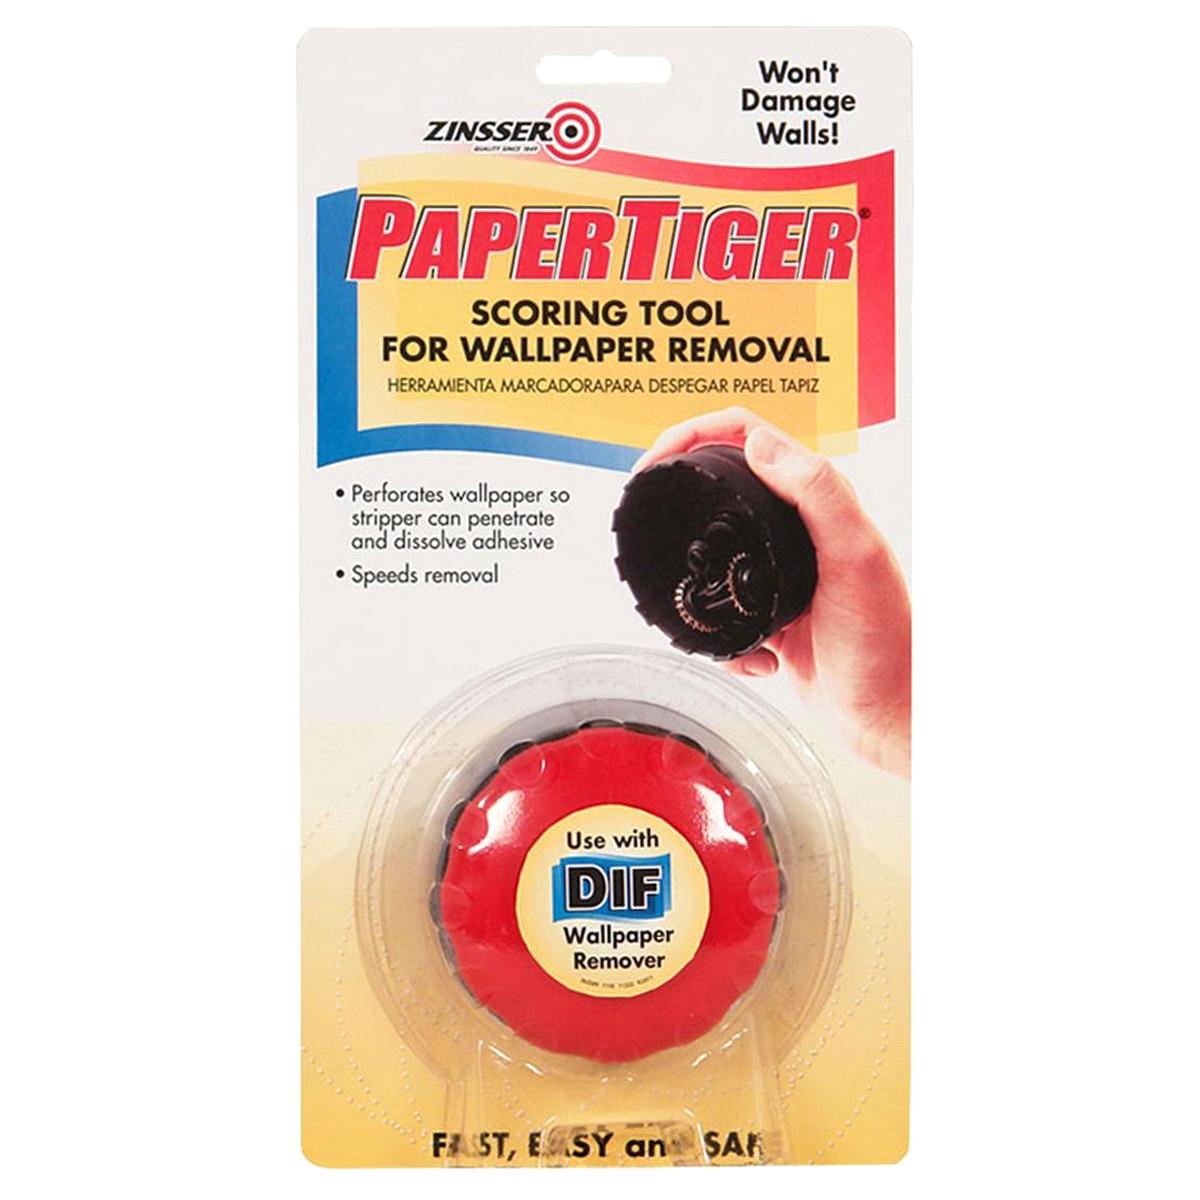 Zinsser PaperTiger Scoring Tool   02966 Wallpaper Removal 1200x1200